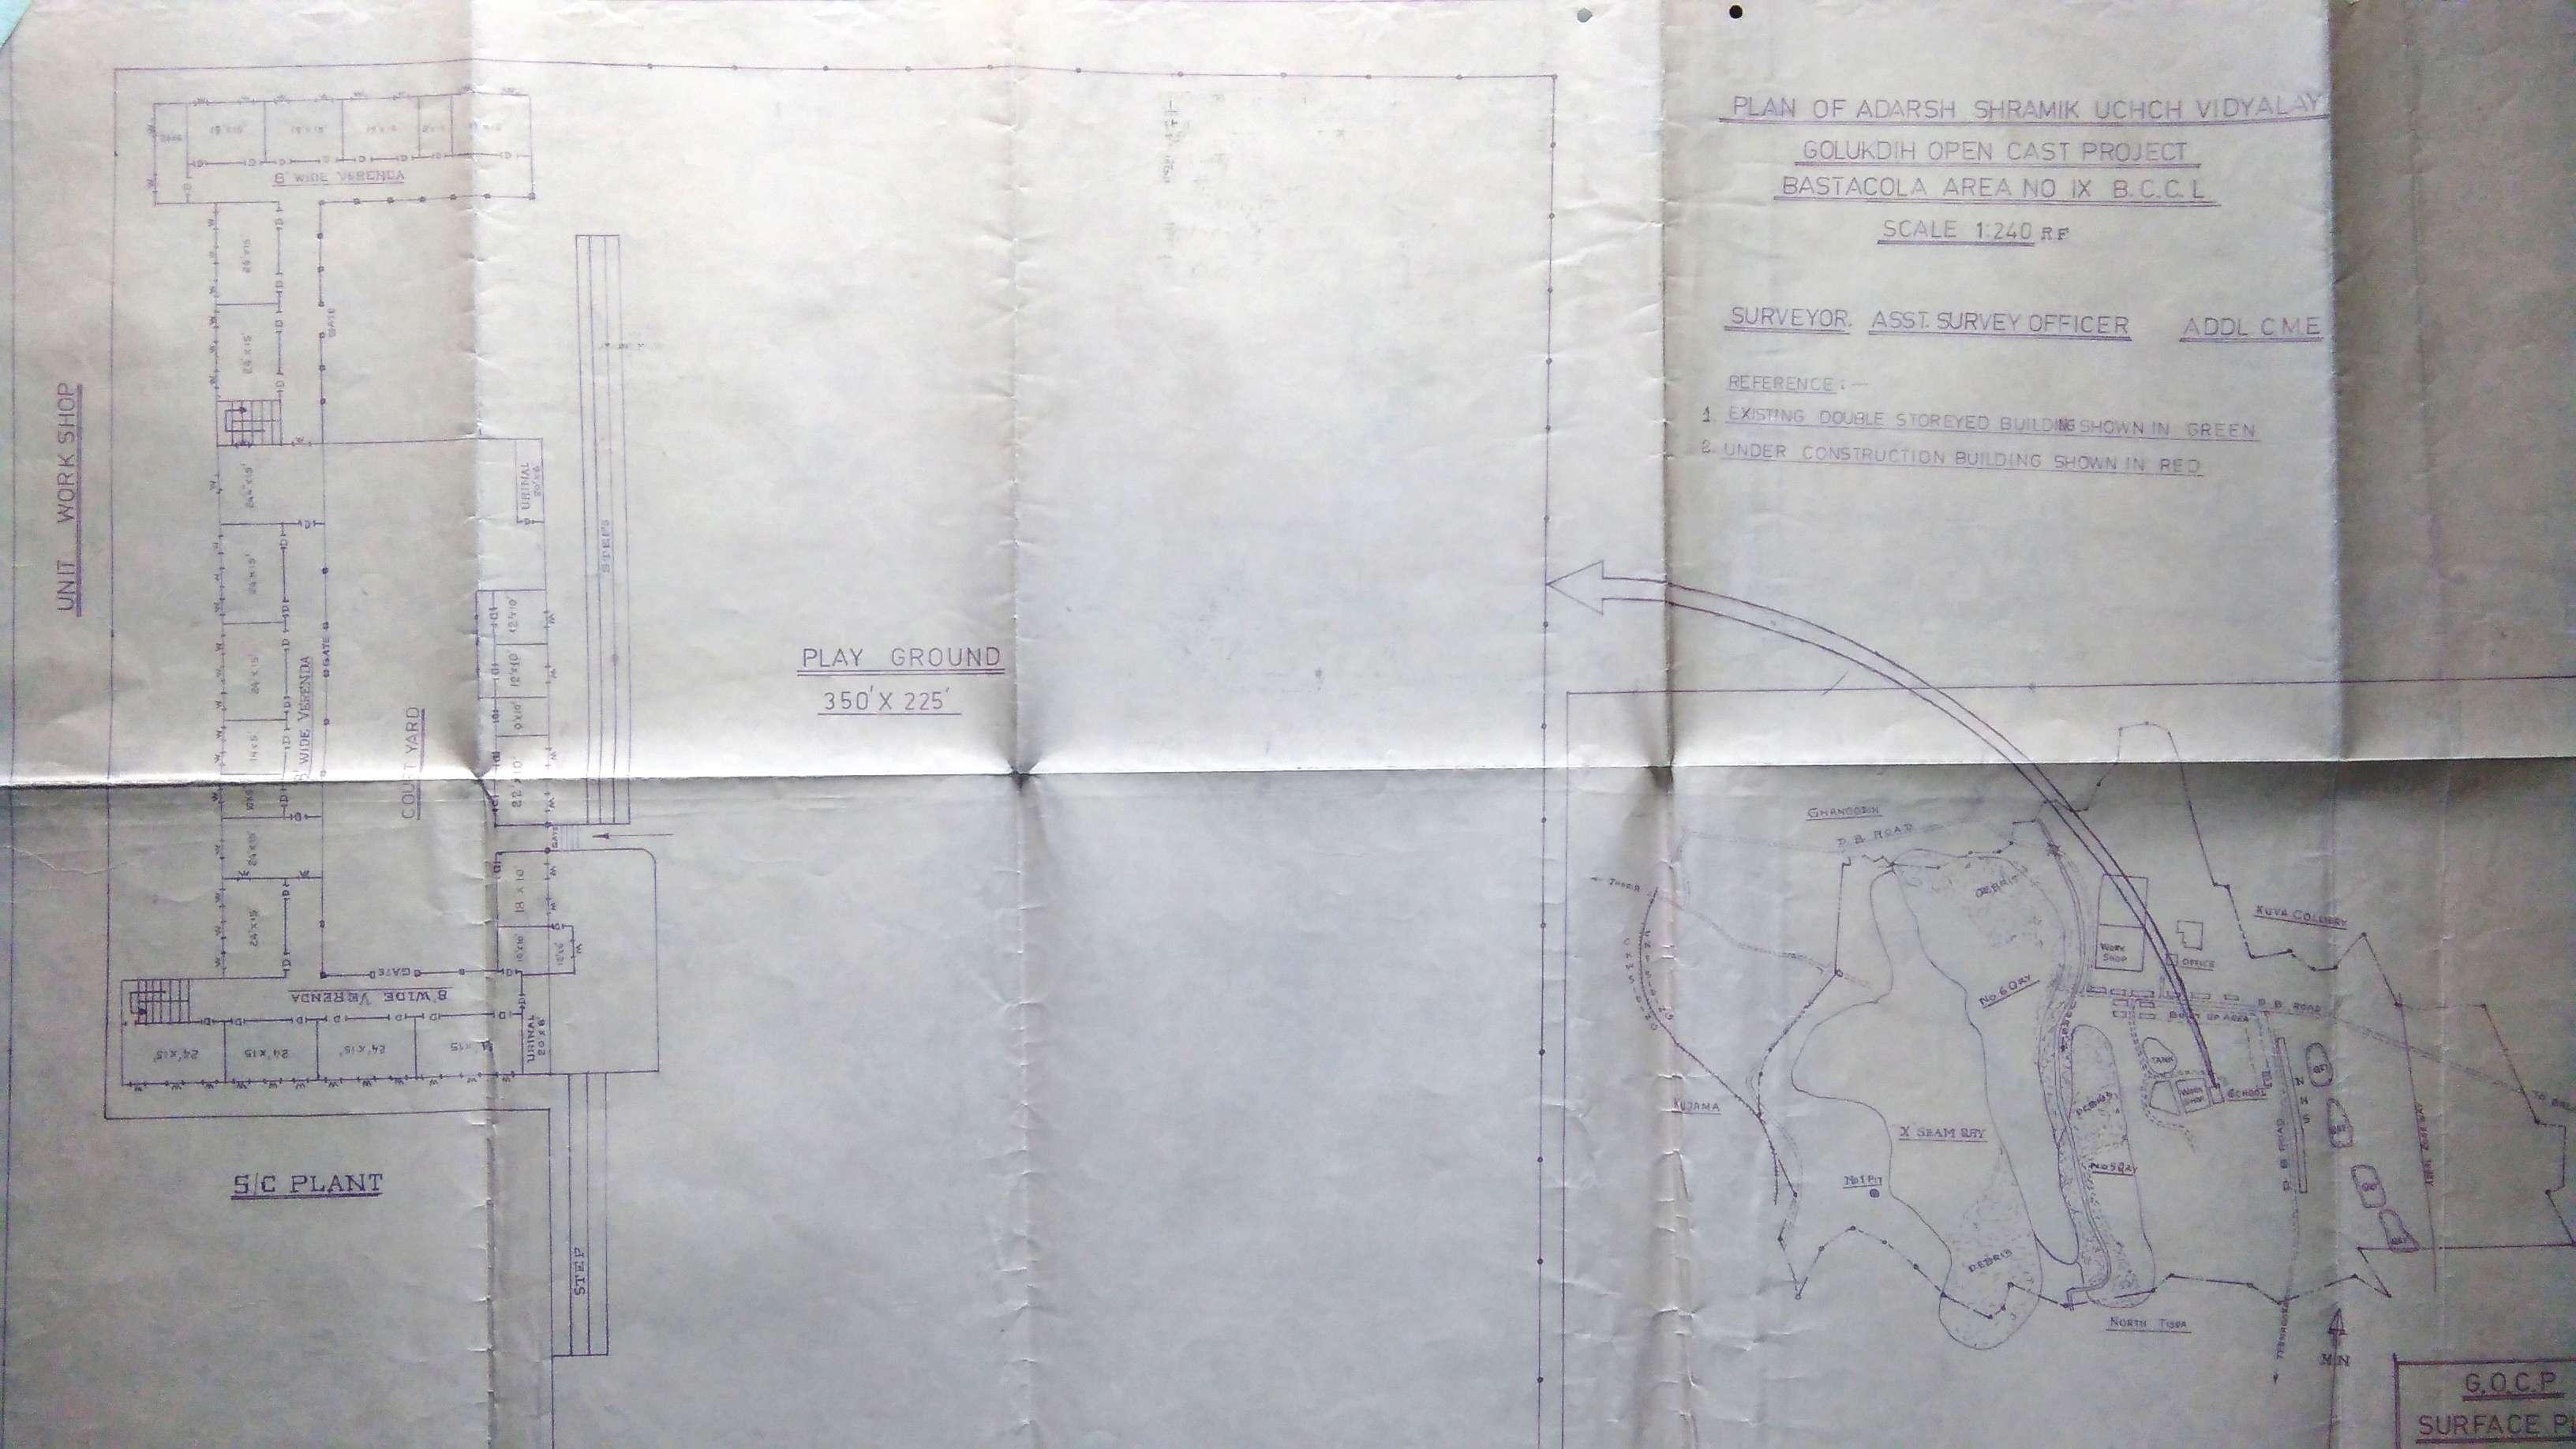 ADARSH SHRAMIK UCHCH VIDYALAYA GOLUKDIH OPEN CART PROJECT AT GOLUKDIH P O JHARIA DISTT DHANBAD JHARKHAND 3430084